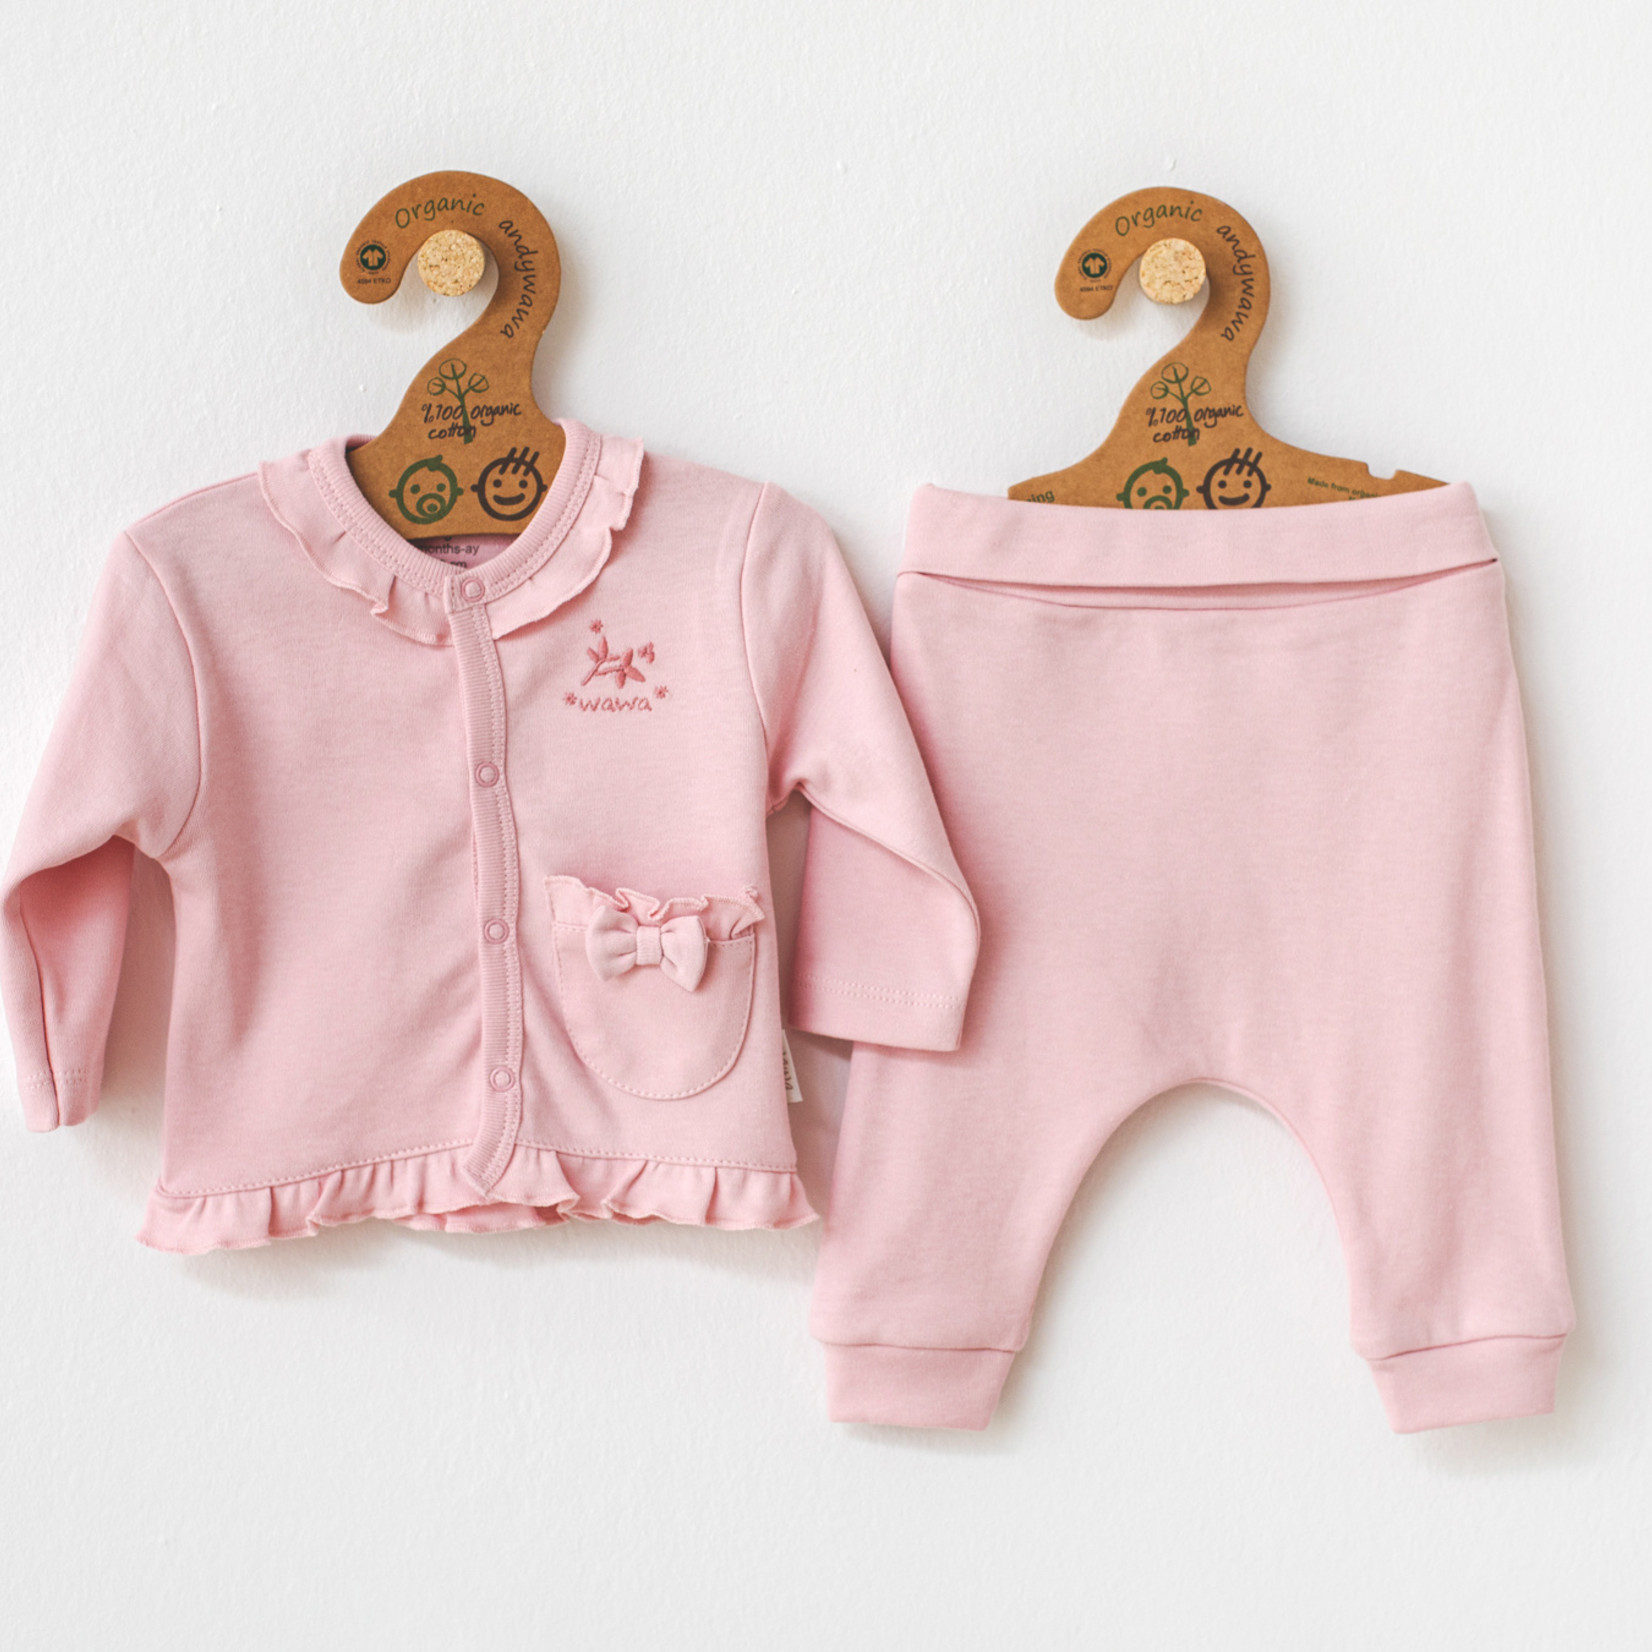 Babymeisjes Biologische Set Natura Wawa